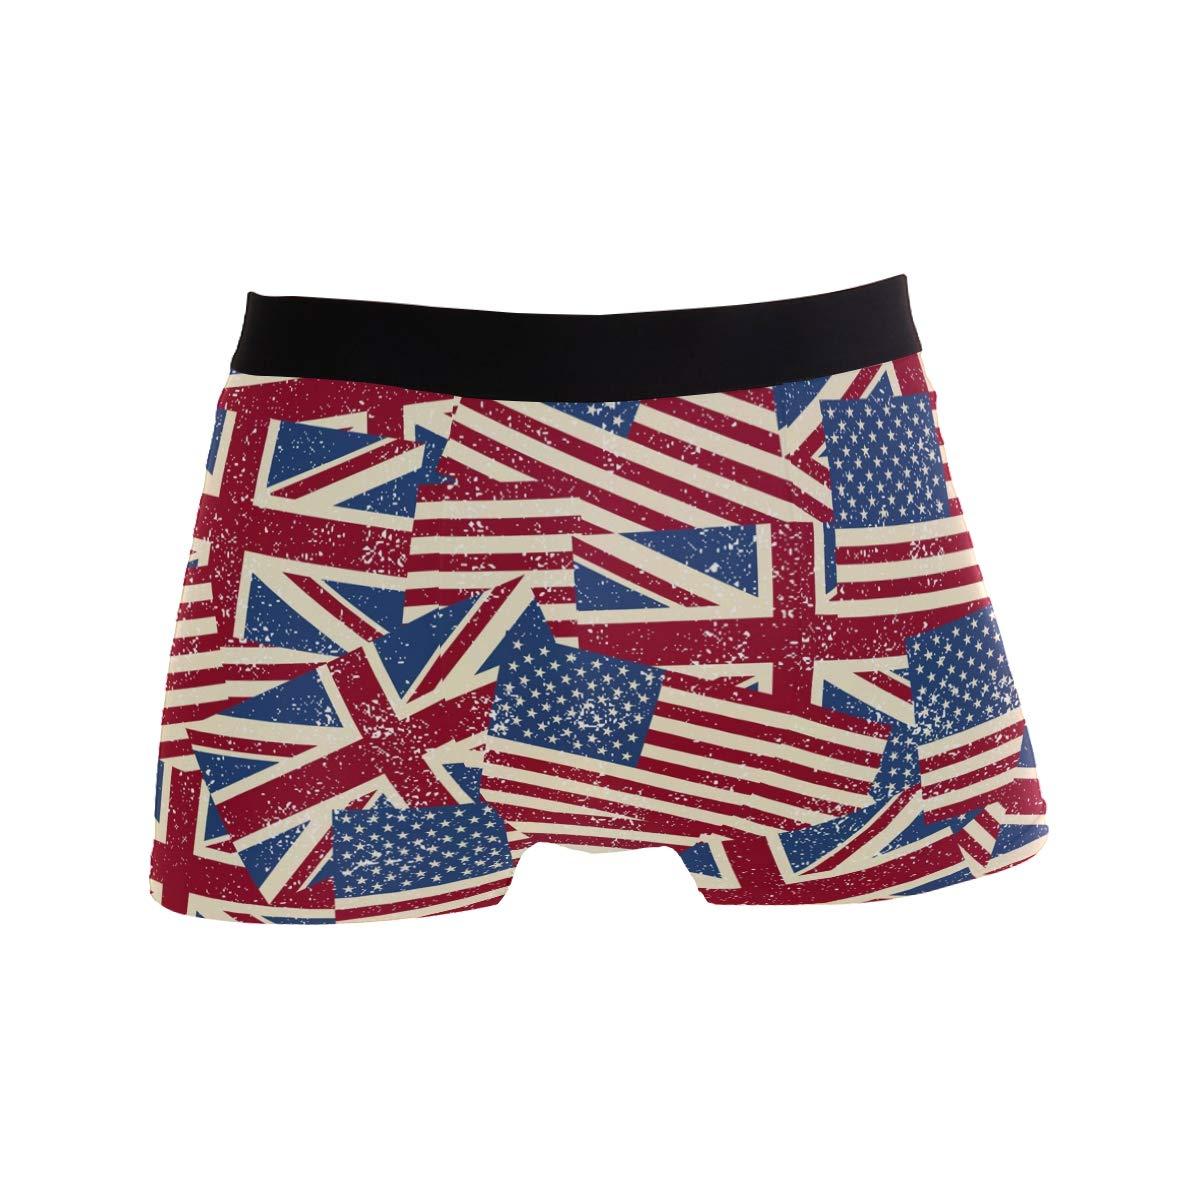 American and UK Flag Trunks for Men Boxer Briefs Mens Underwear